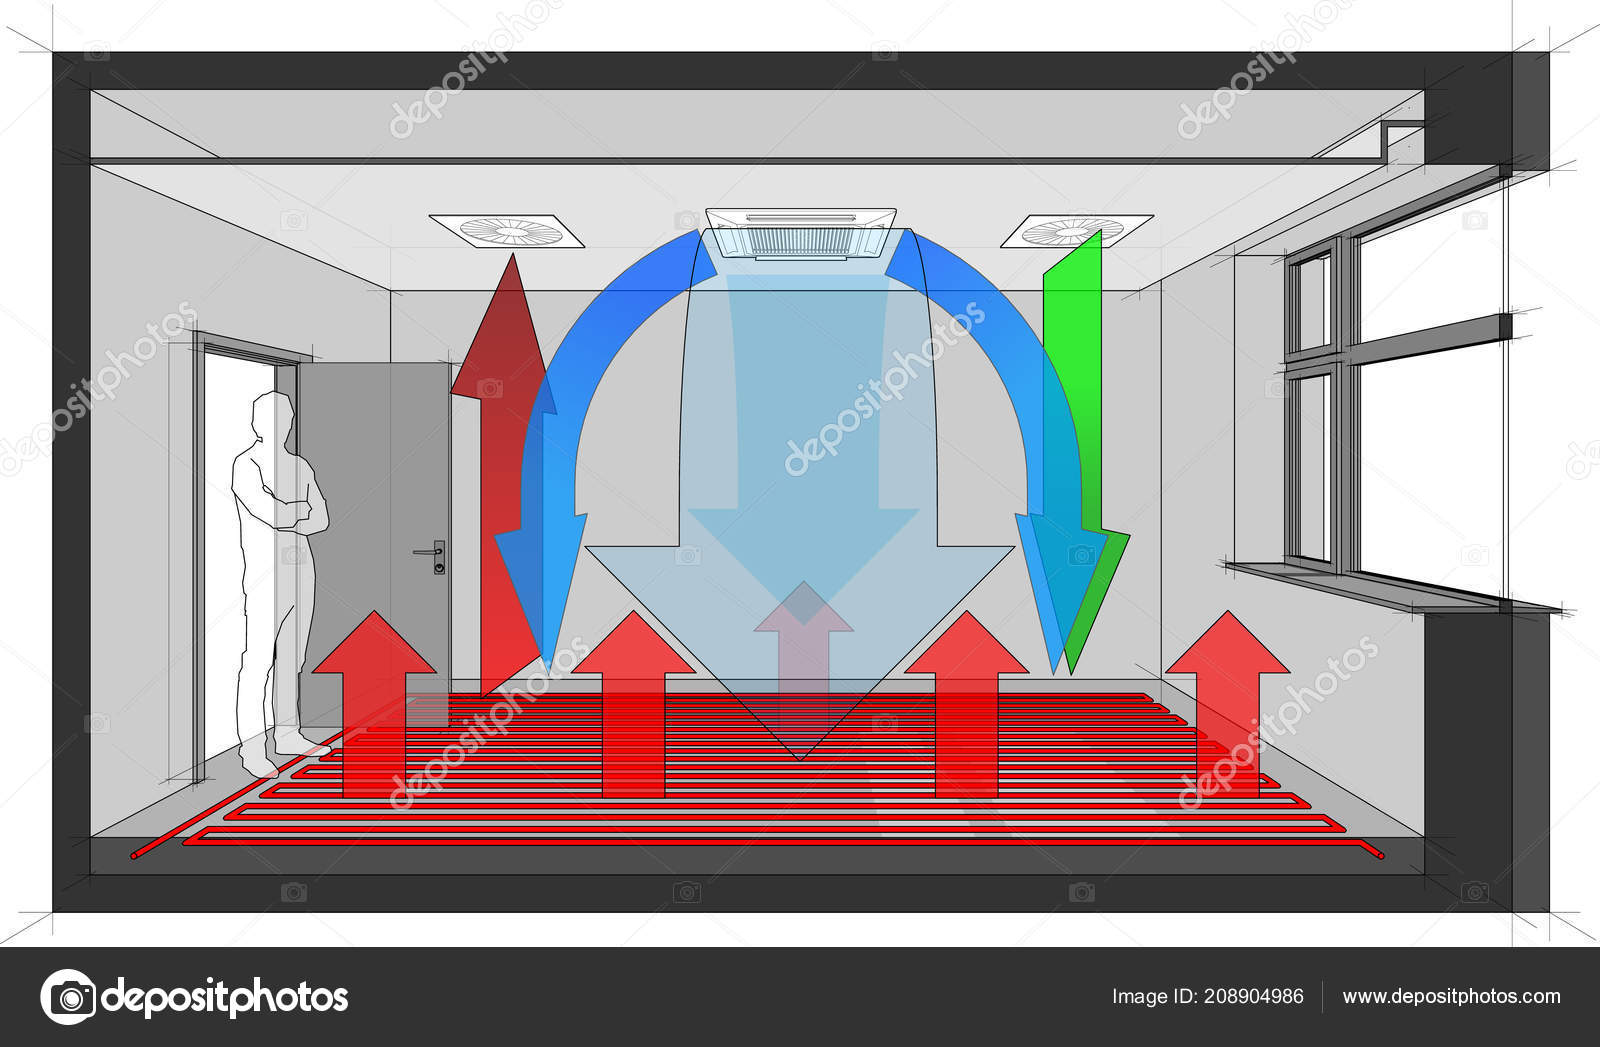 diagram room ventilated cooled ceiling built air ventilation air